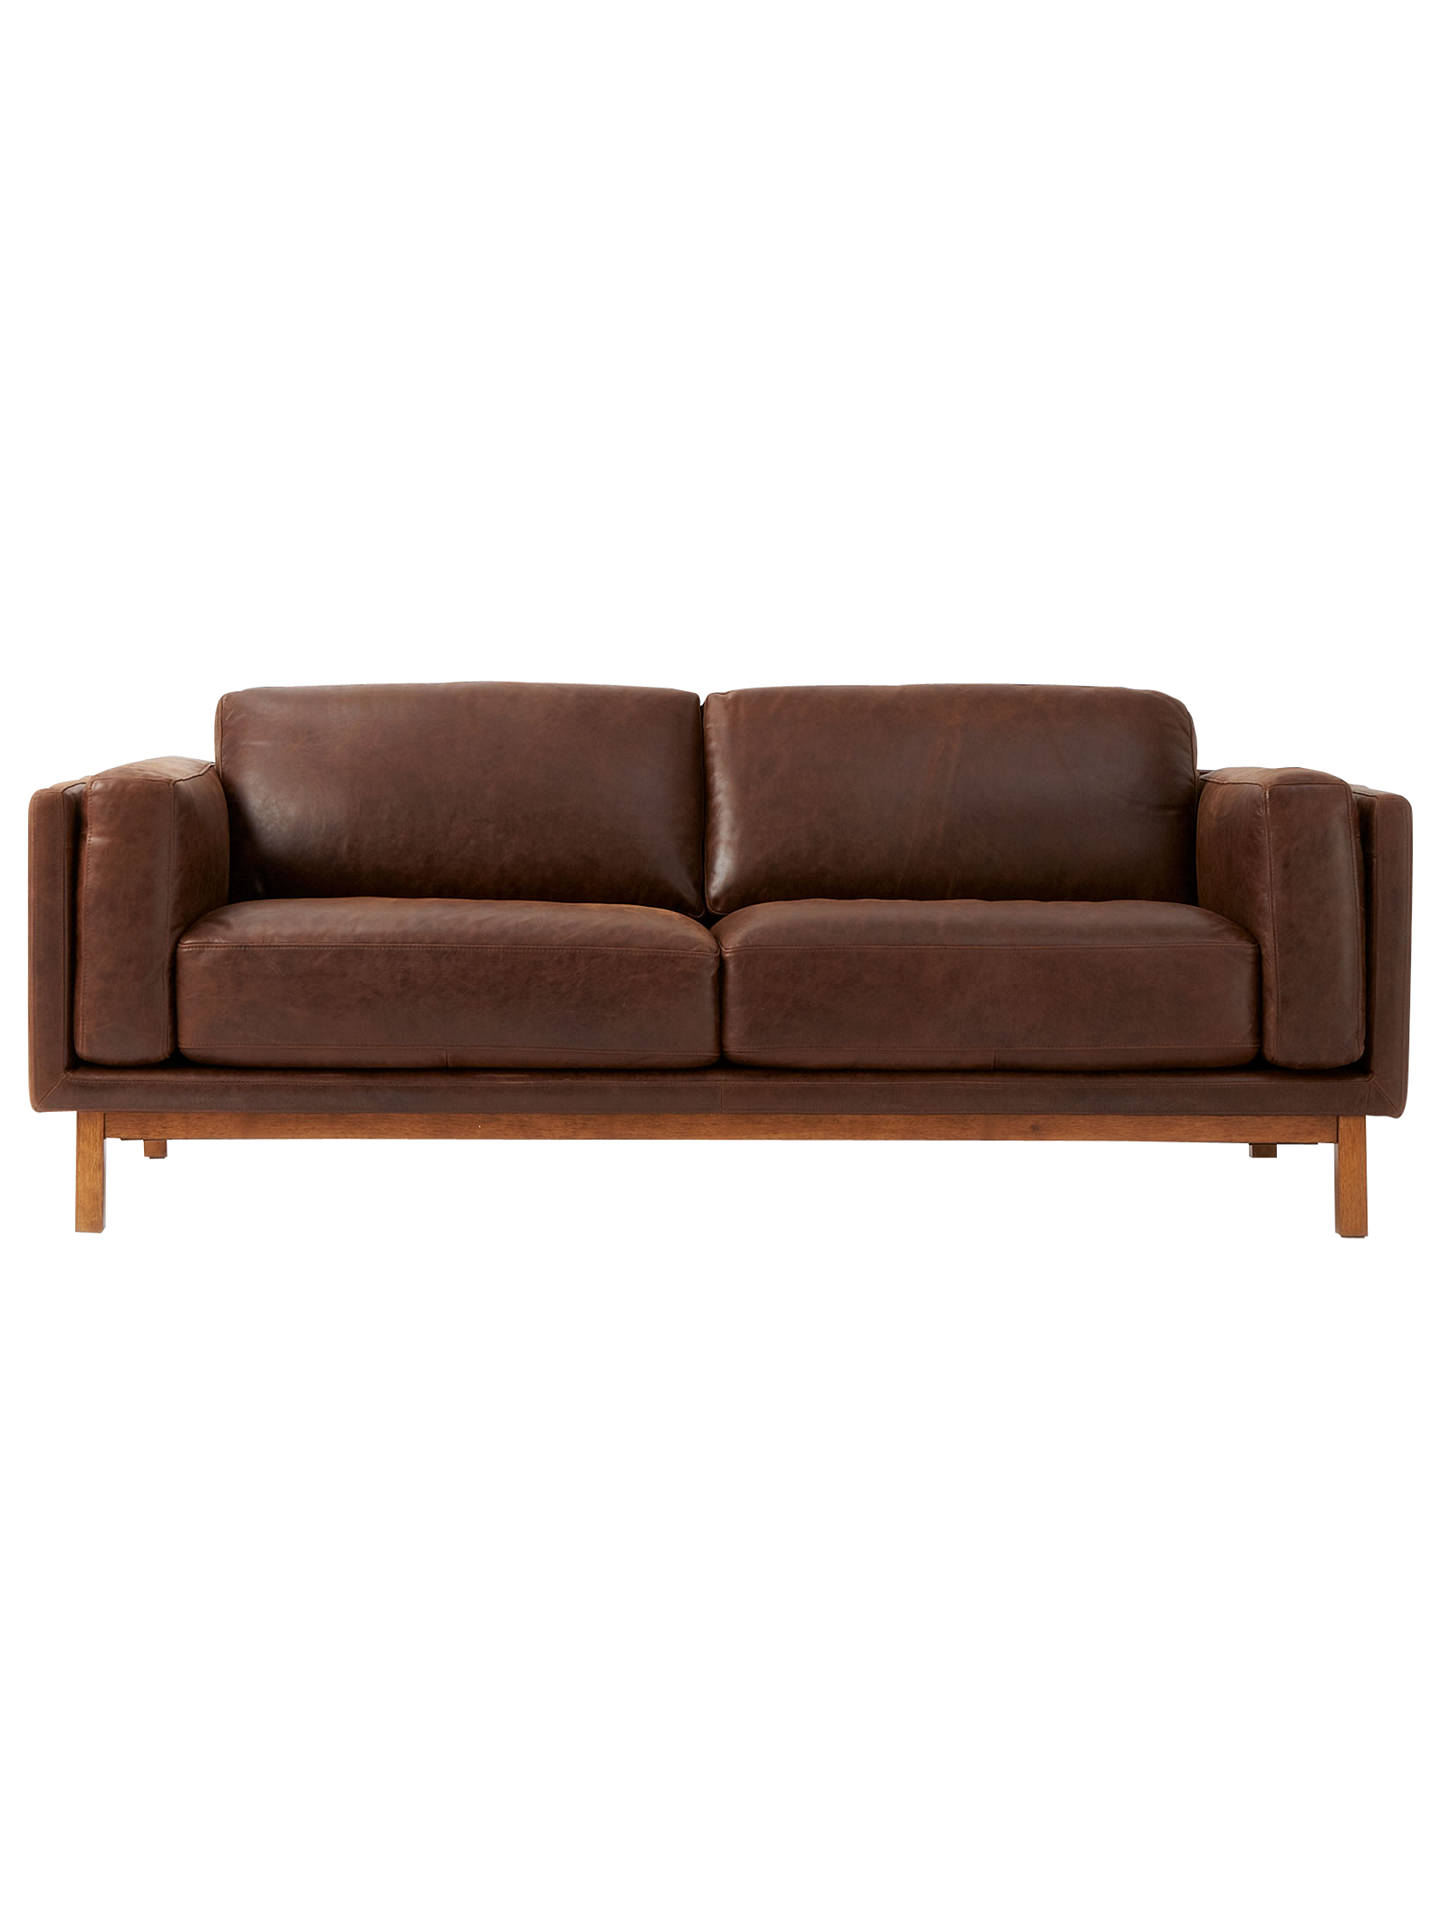 West Elm Dekalb Aniline Leather Sofa Molasses At John